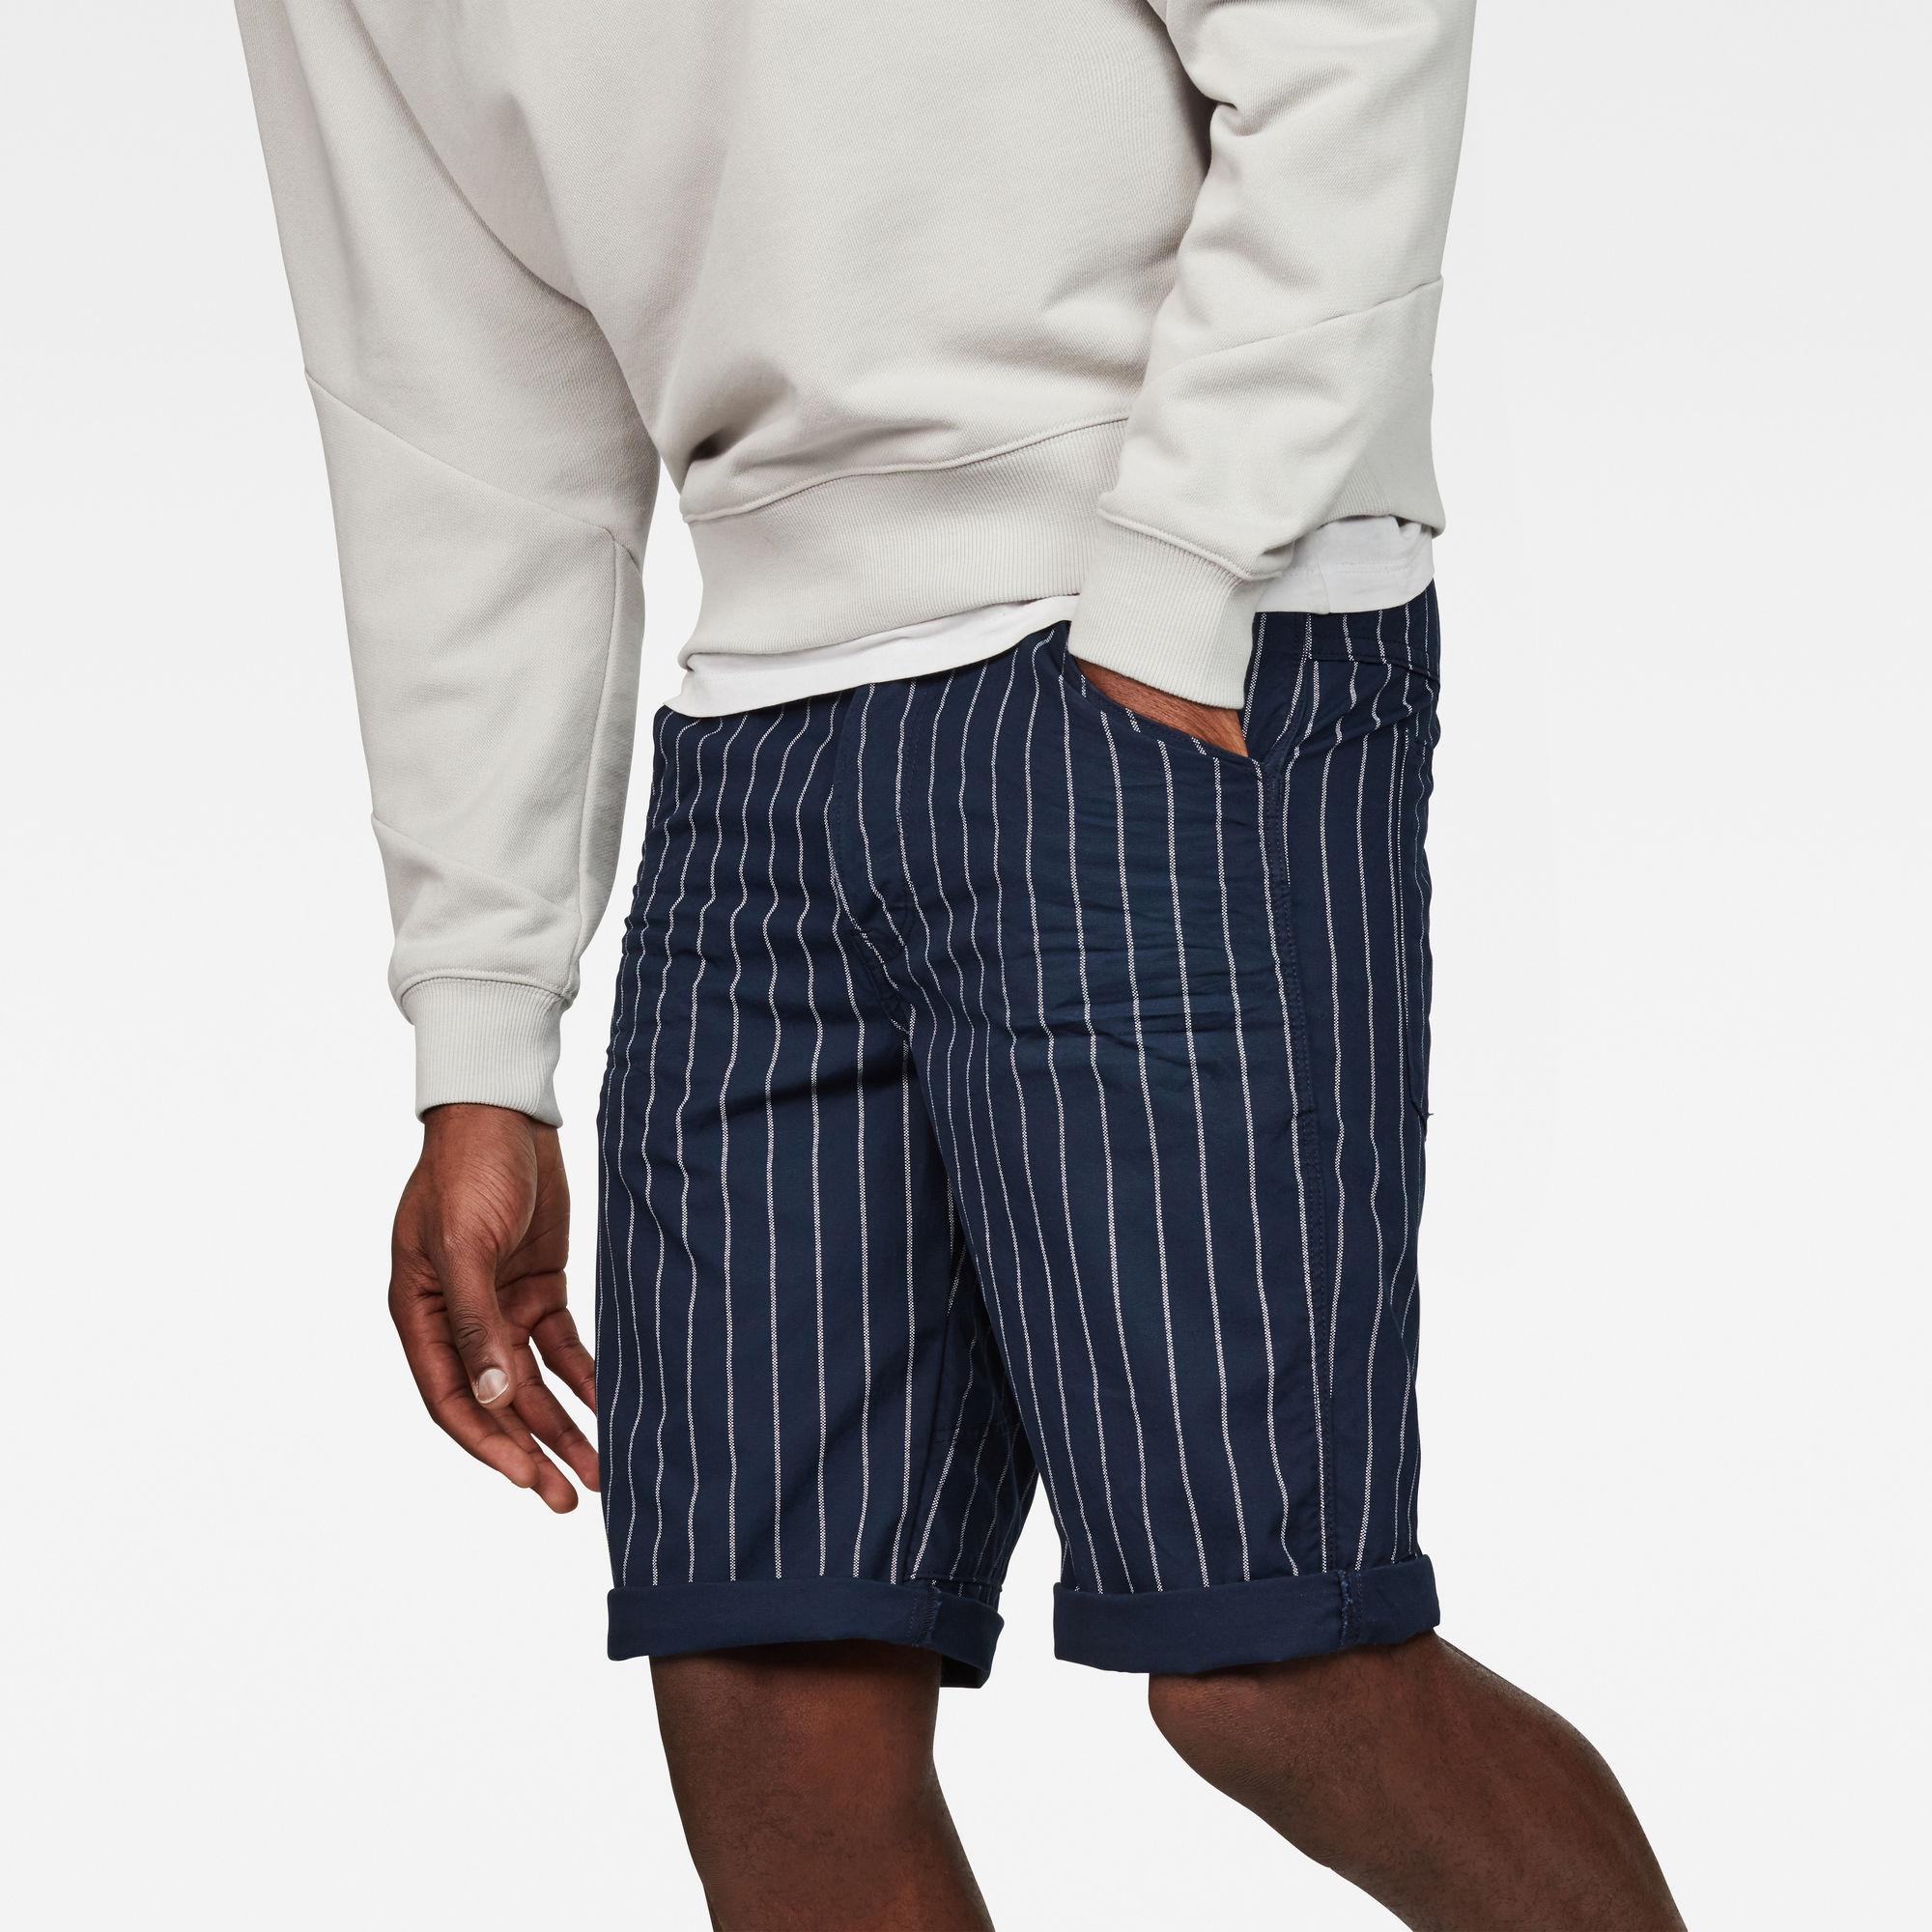 G-Star Elwood 5622 3D Sport 1 2-Length Shorts